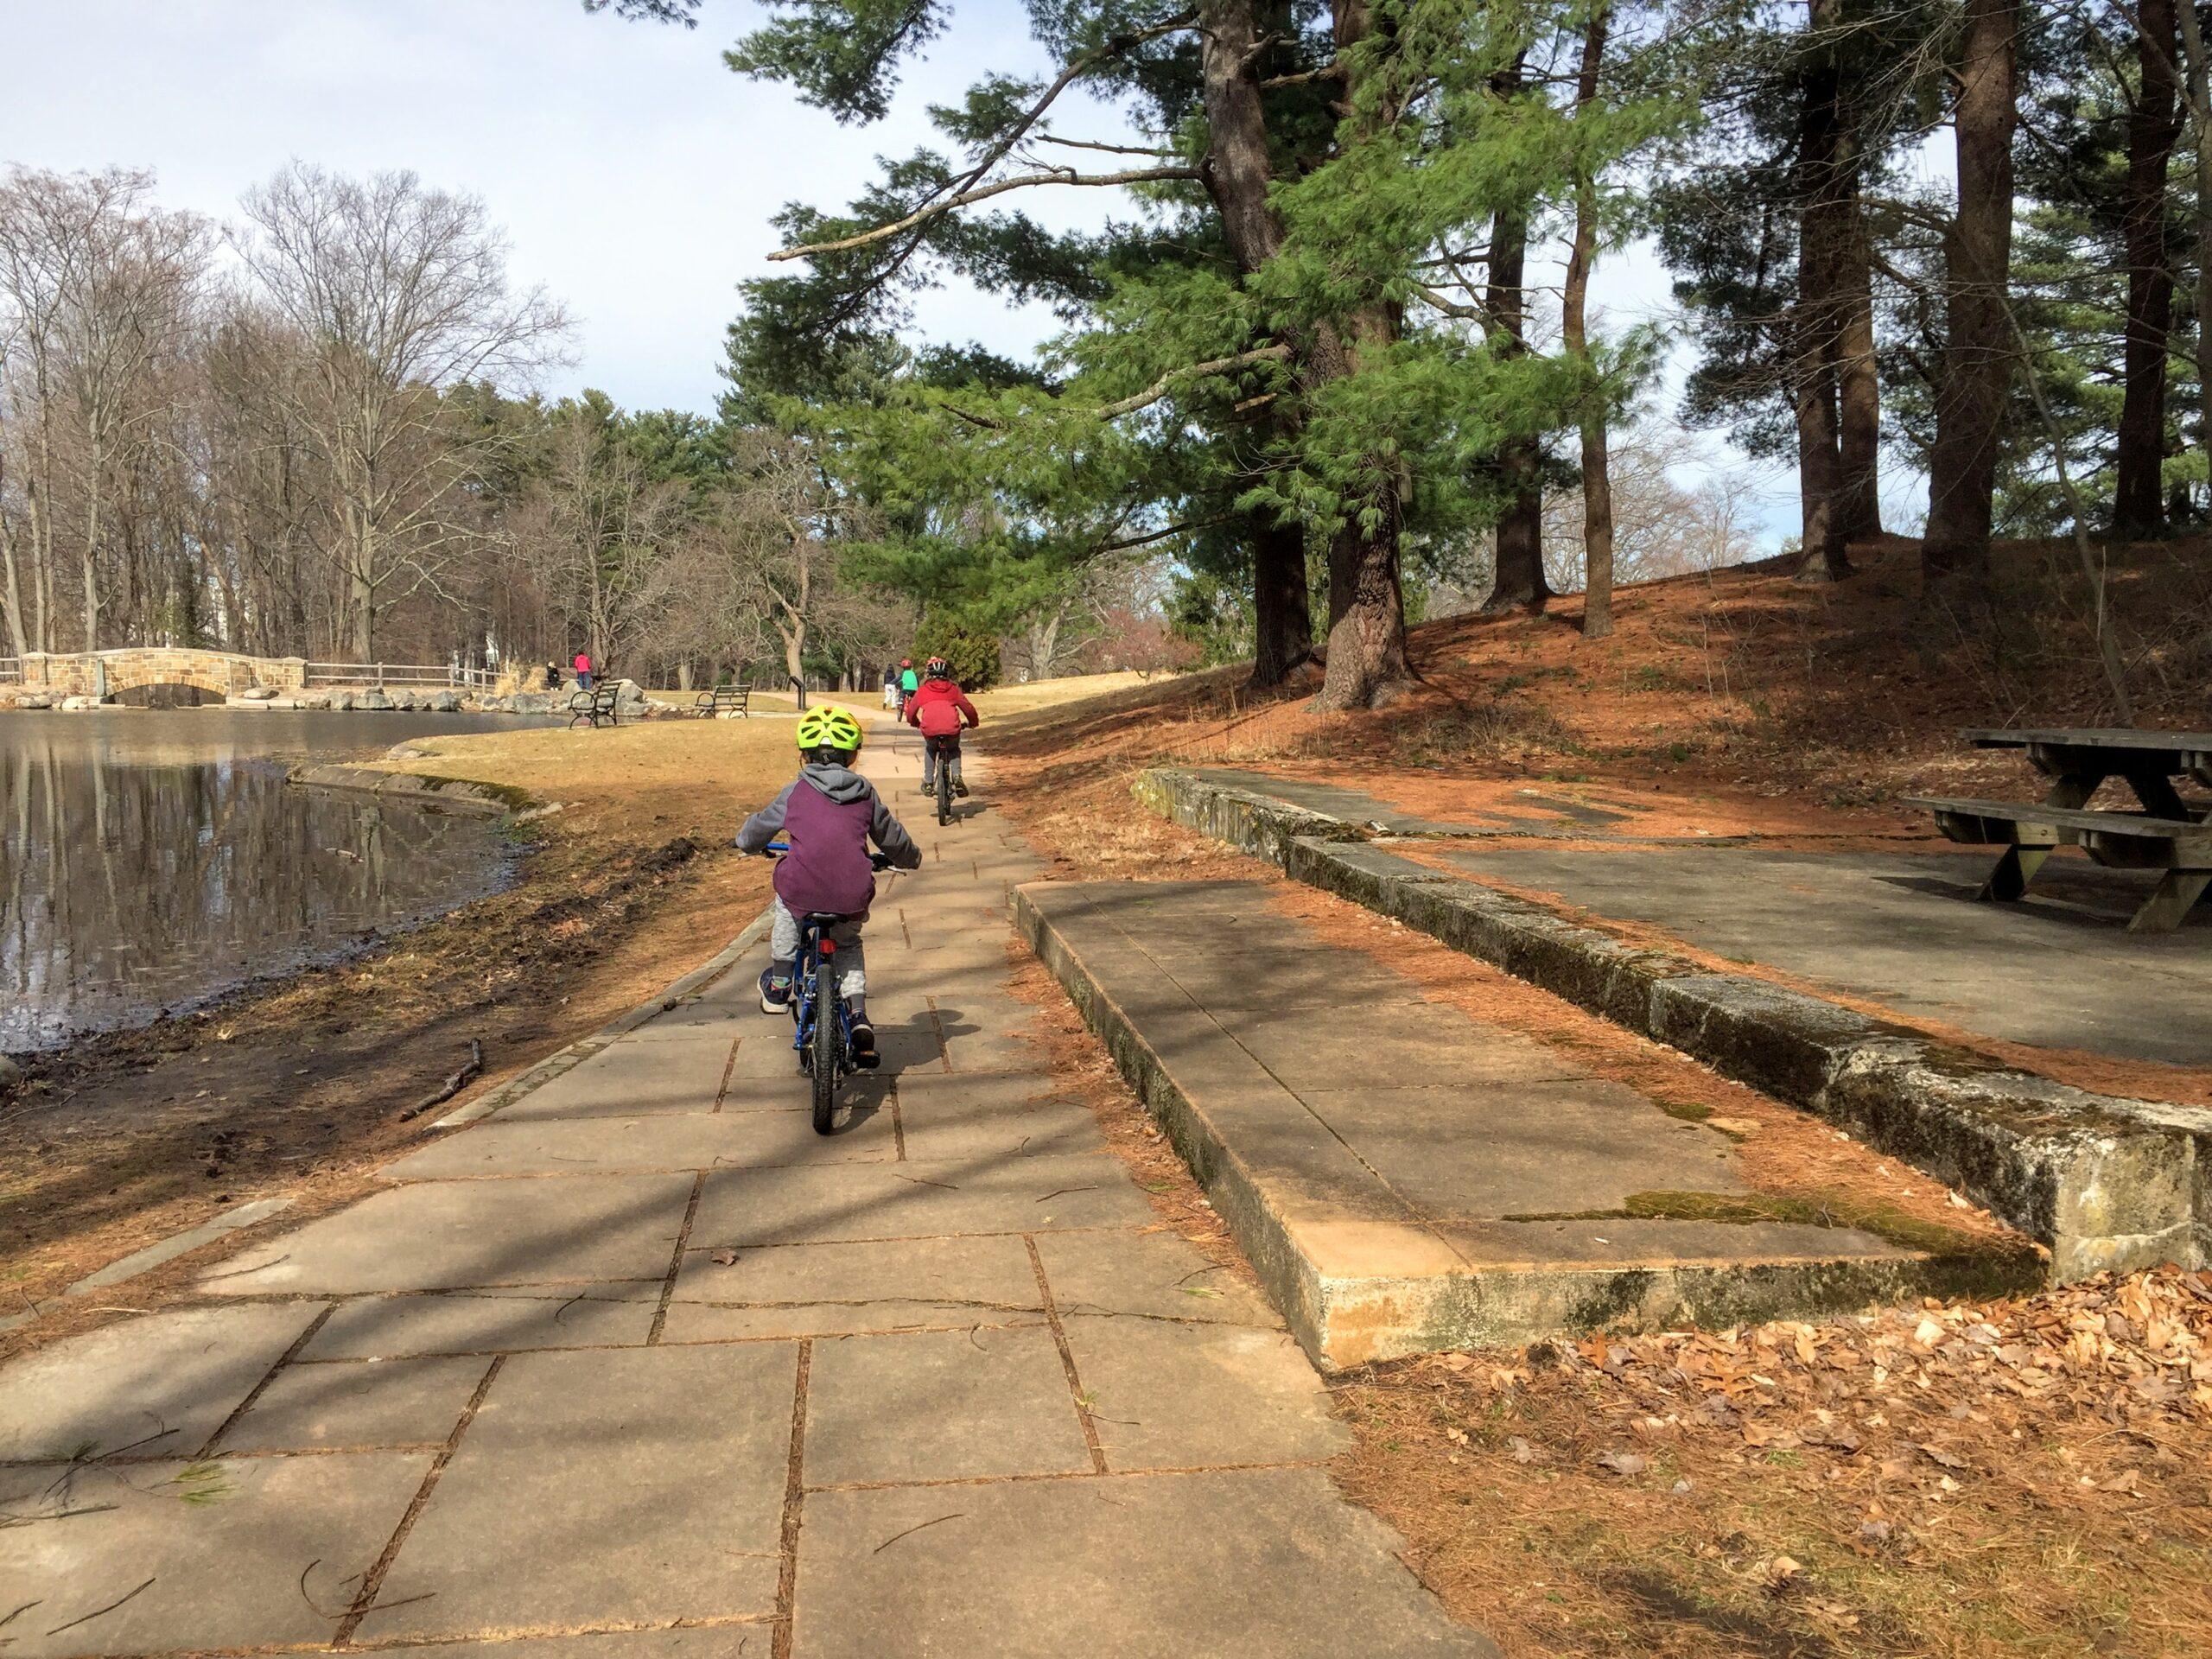 Riding bike at Francis William Bird Park